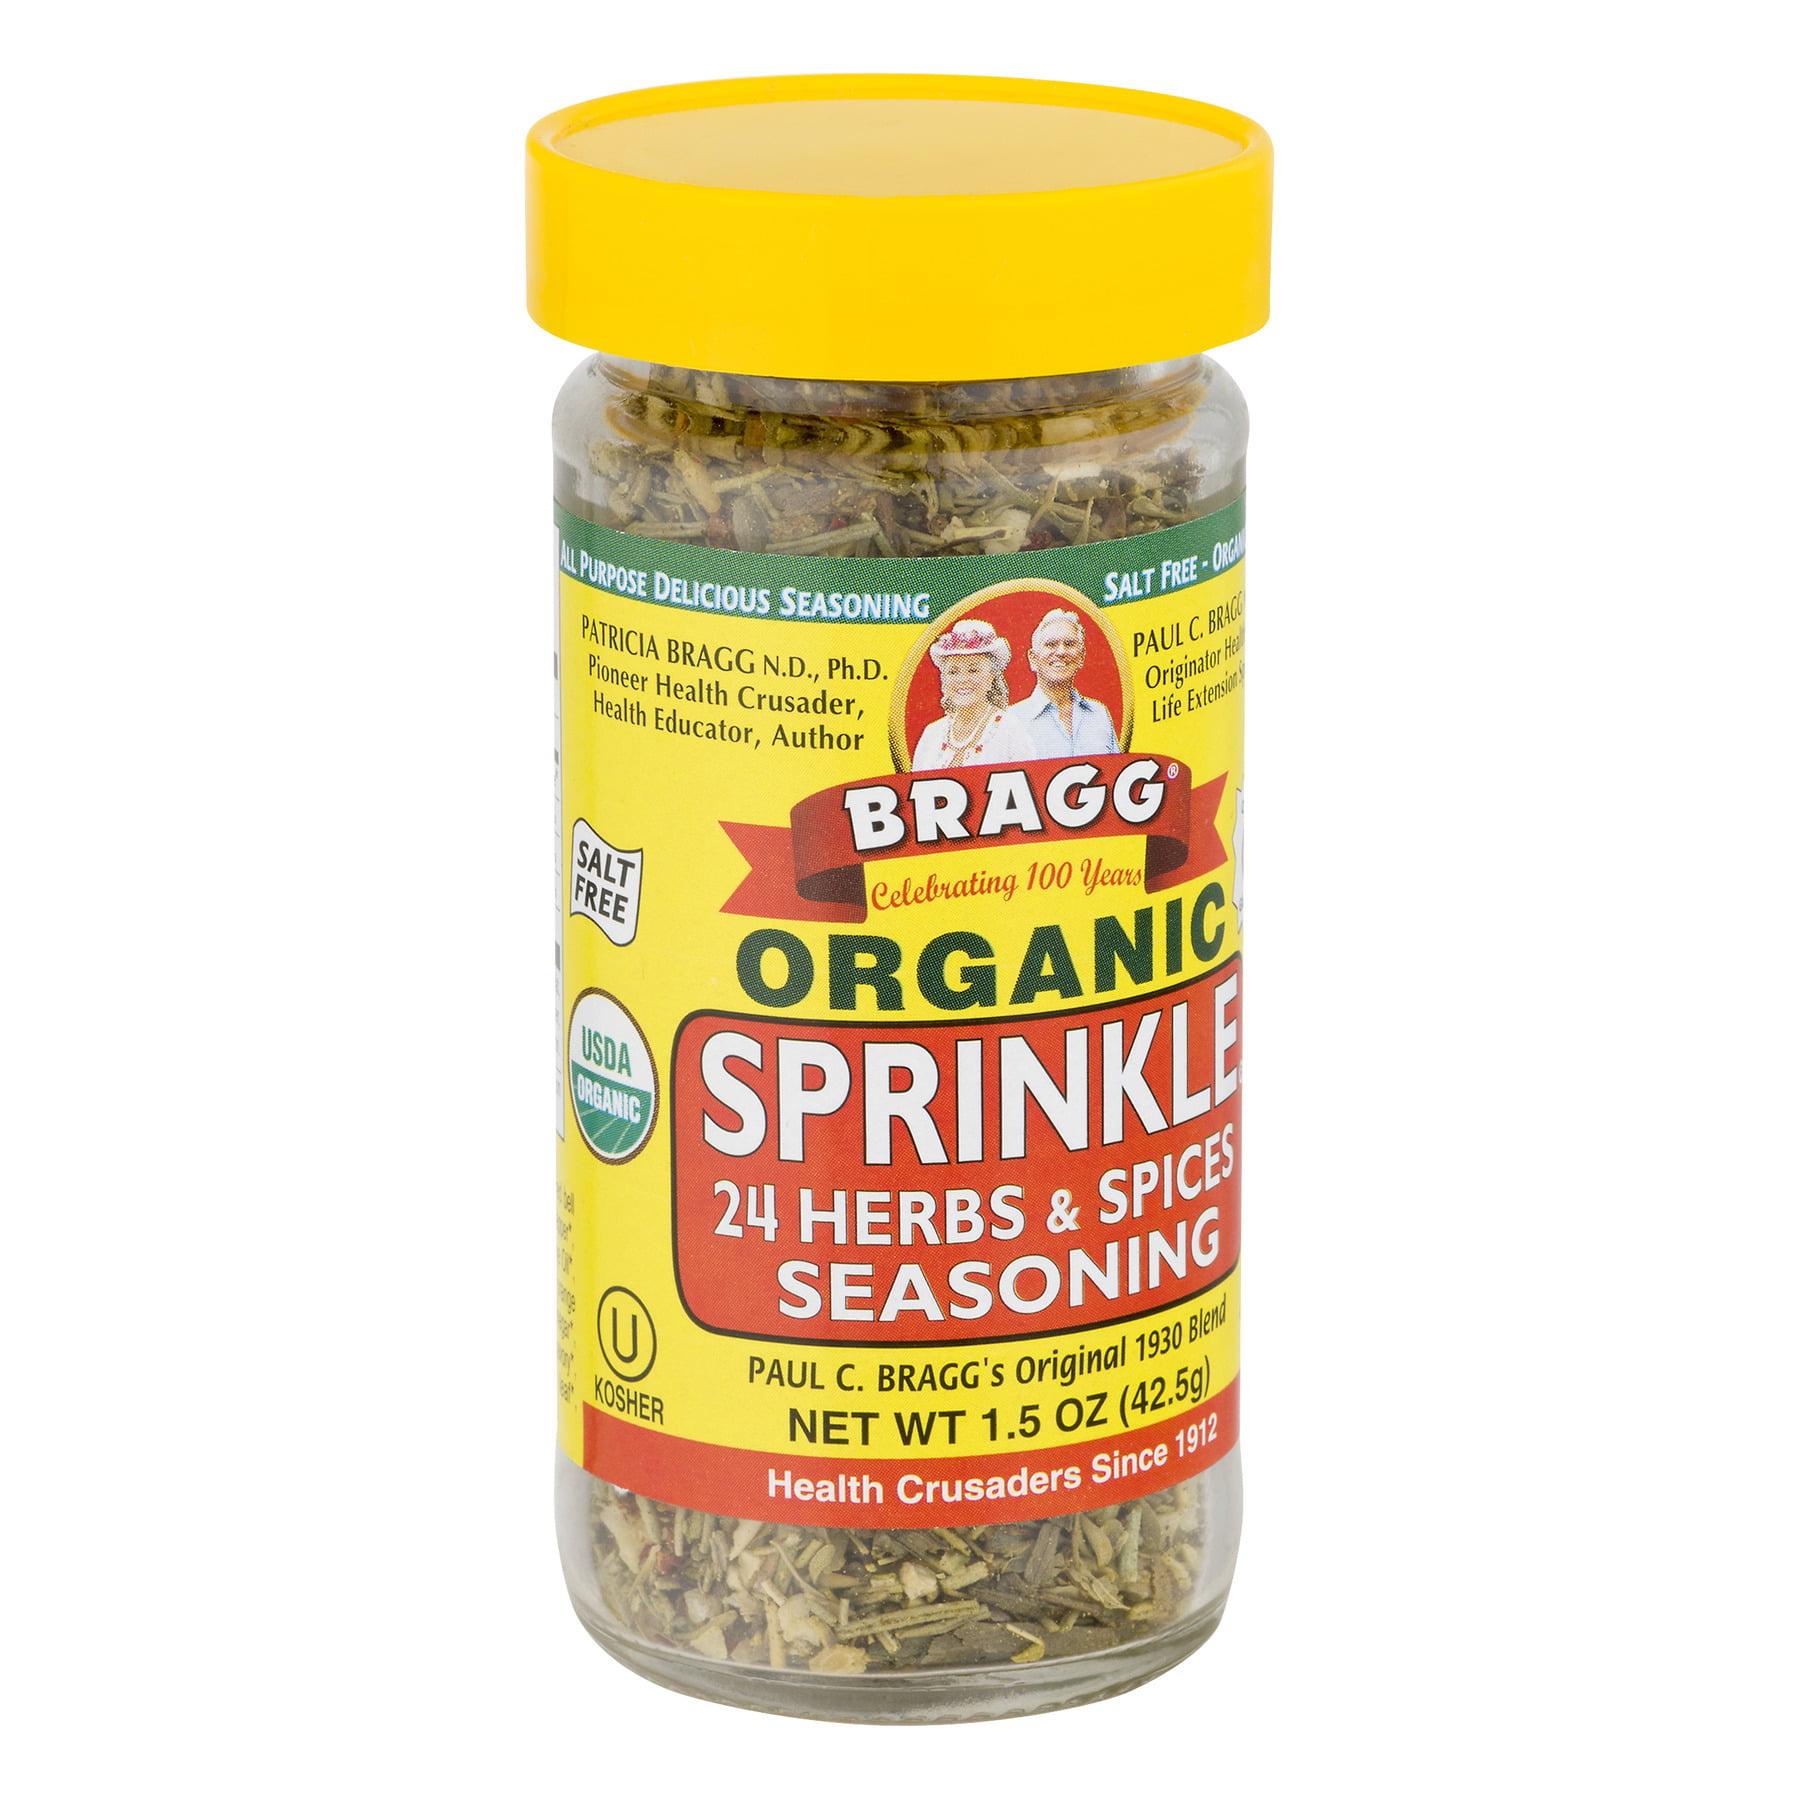 Bragg Organic Sprinkle Seasoning (Non-GMO Certified), 1.5 OZ